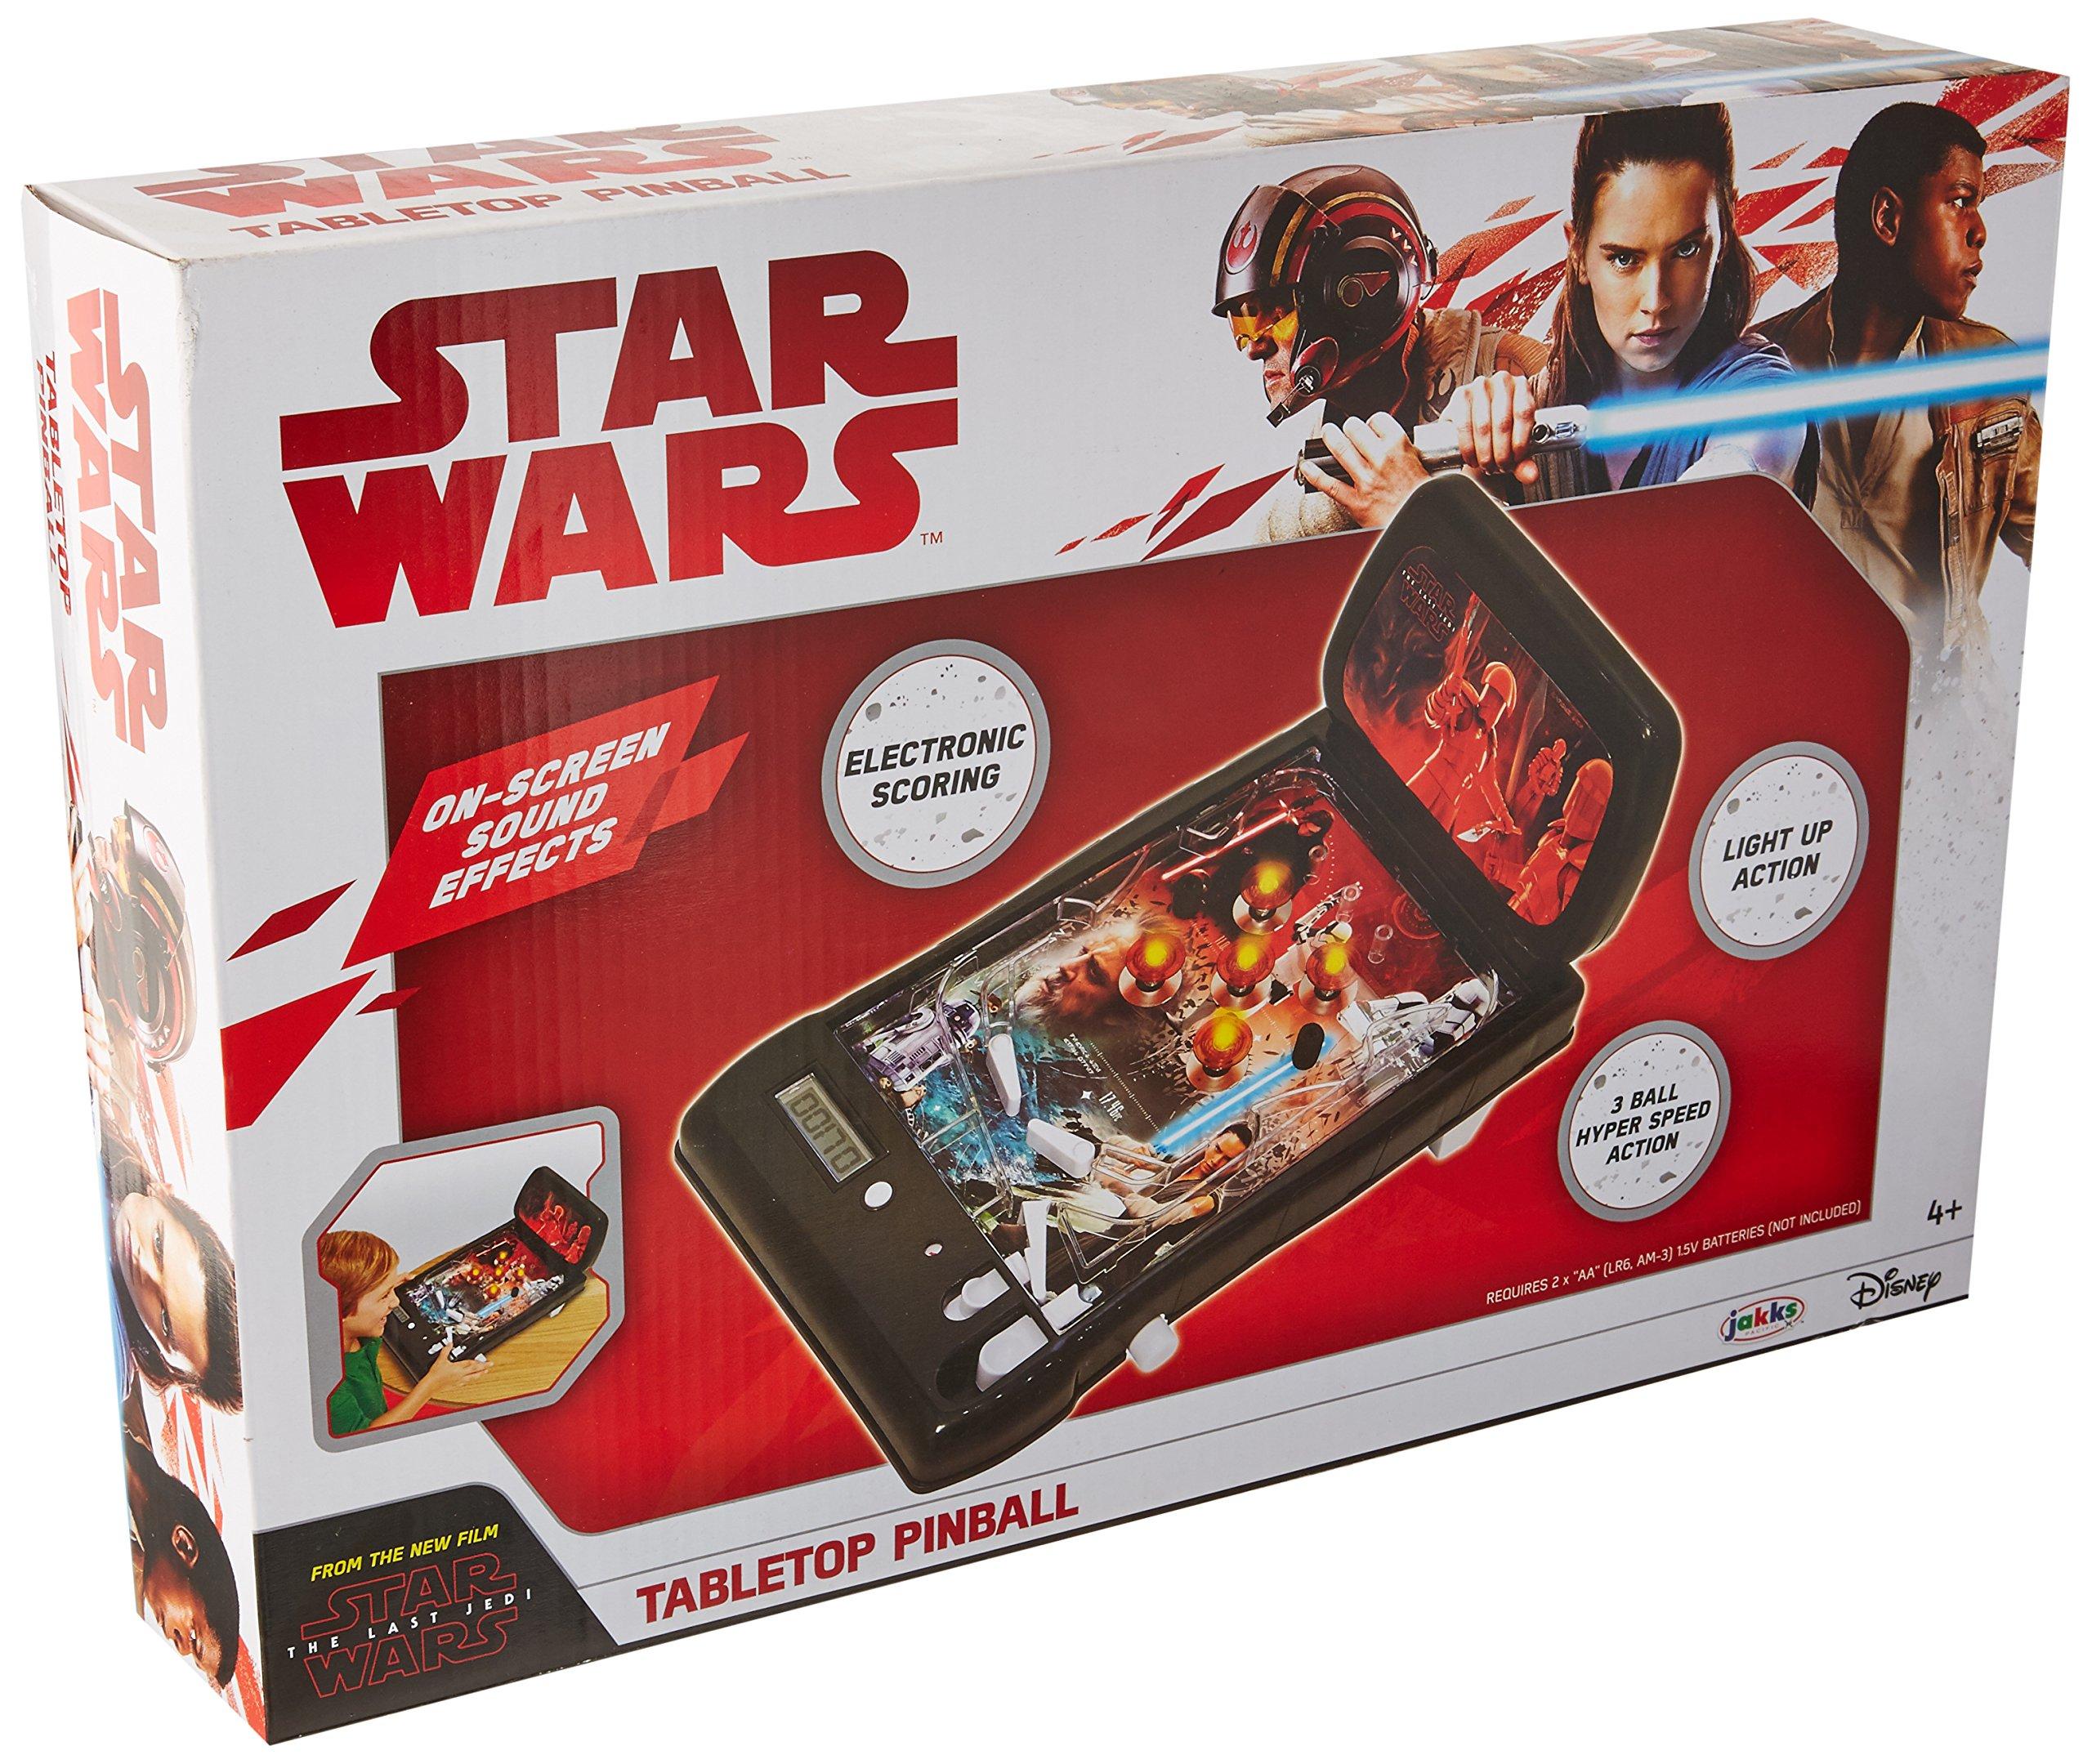 Star Wars The Last Jedi Tabletop Pinball by Star Wars (Image #1)